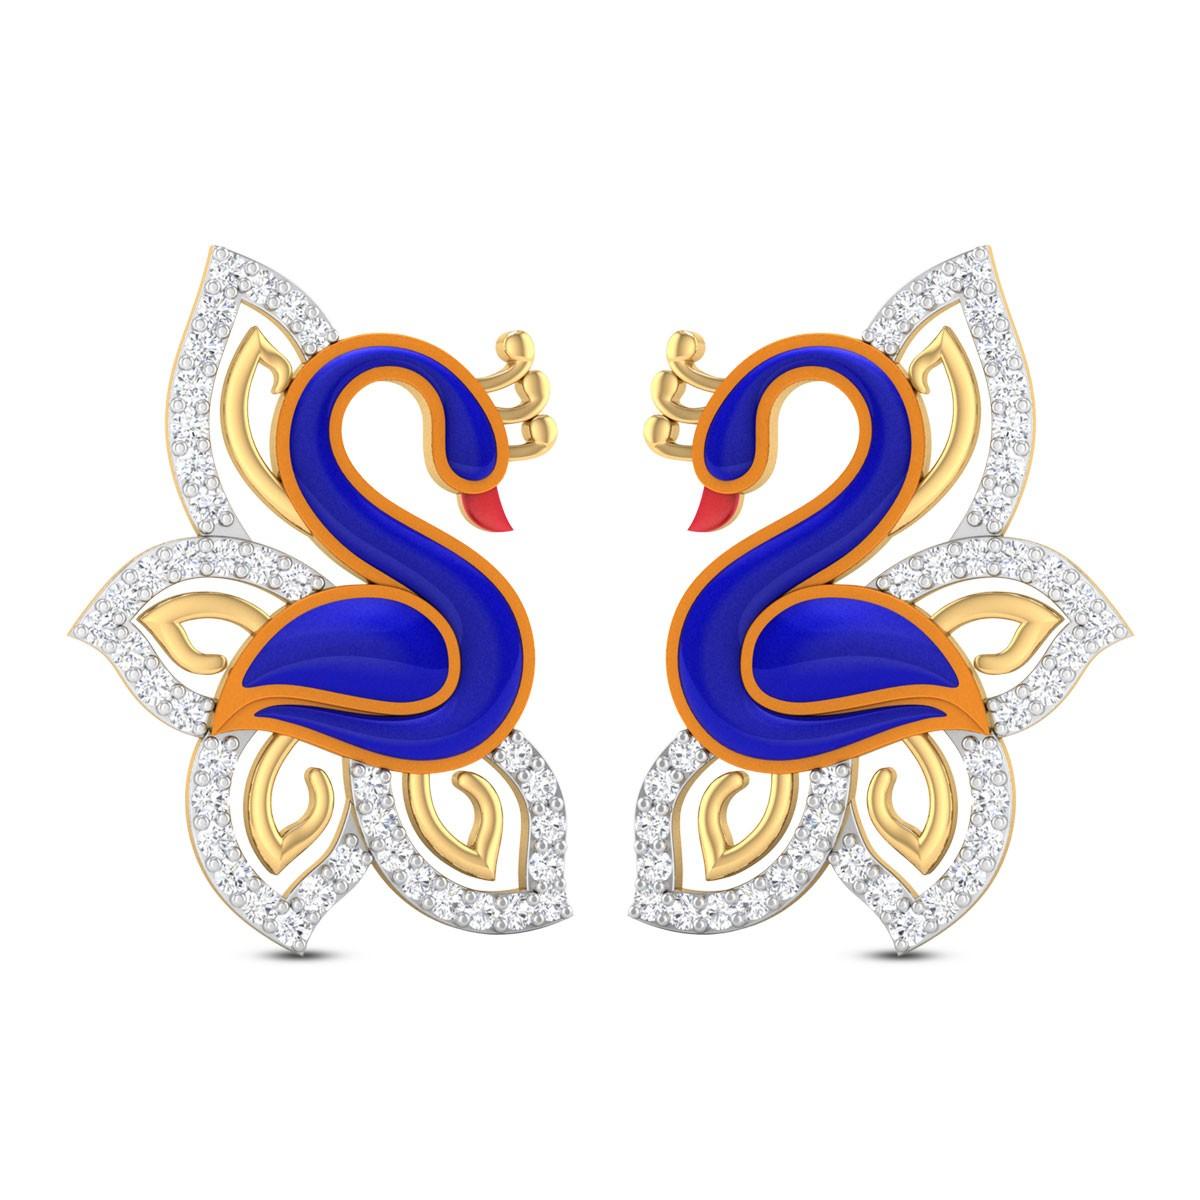 Waverly Peacock Diamond Stud Earrings